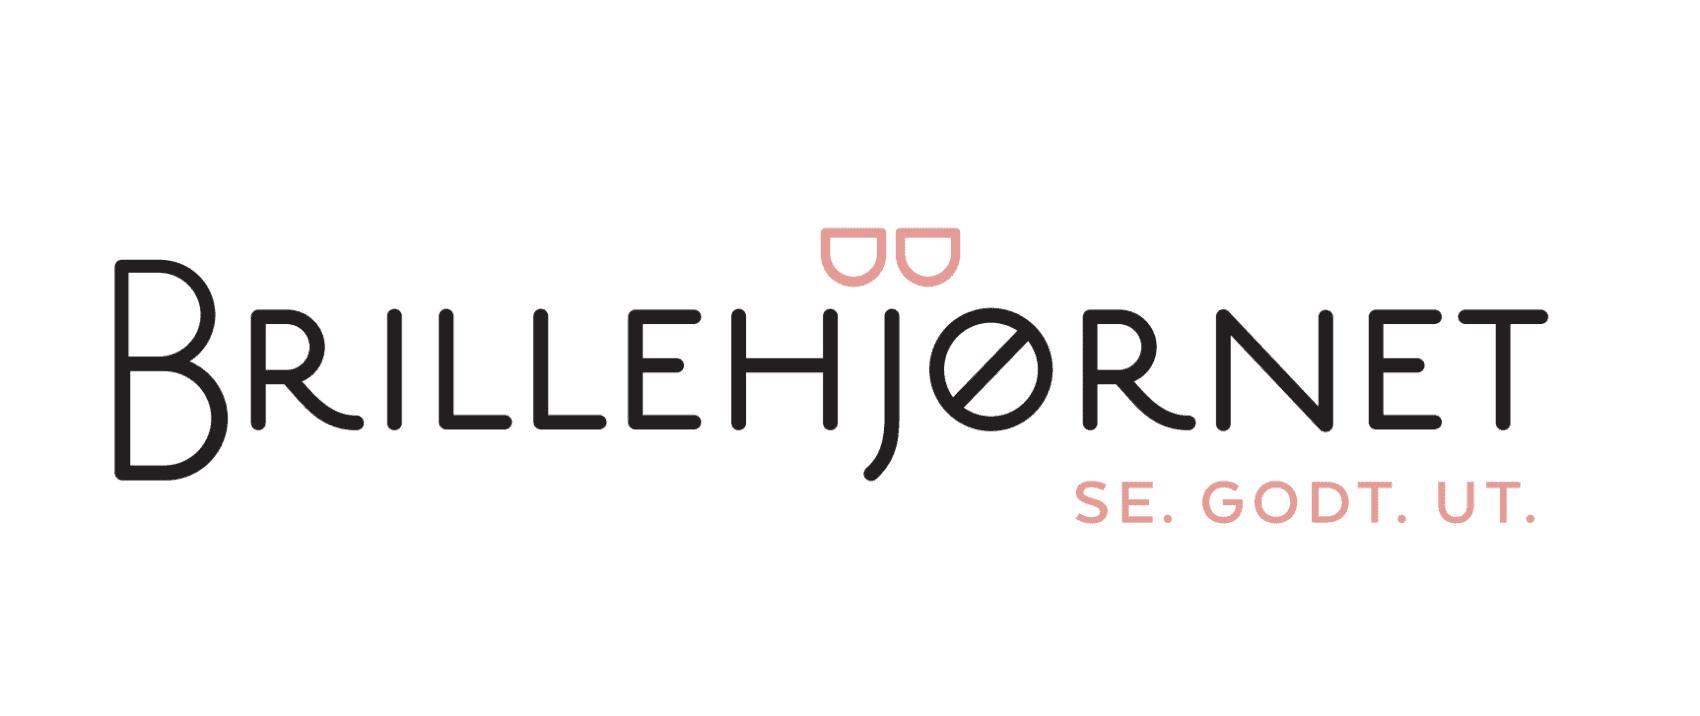 Logo 2020 11 10 174506